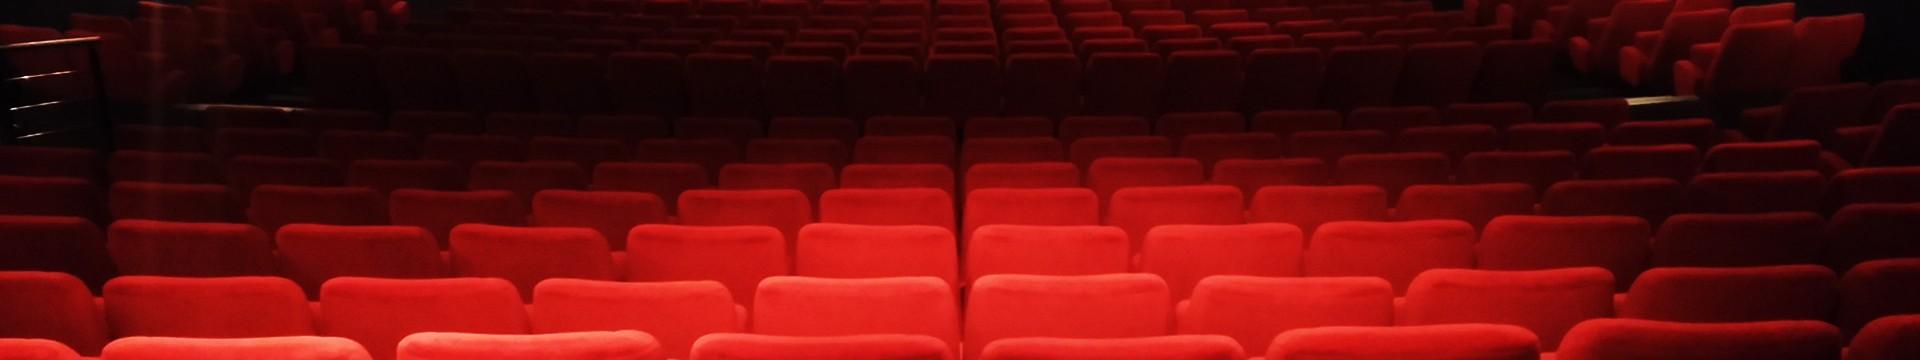 cinema-01-9172